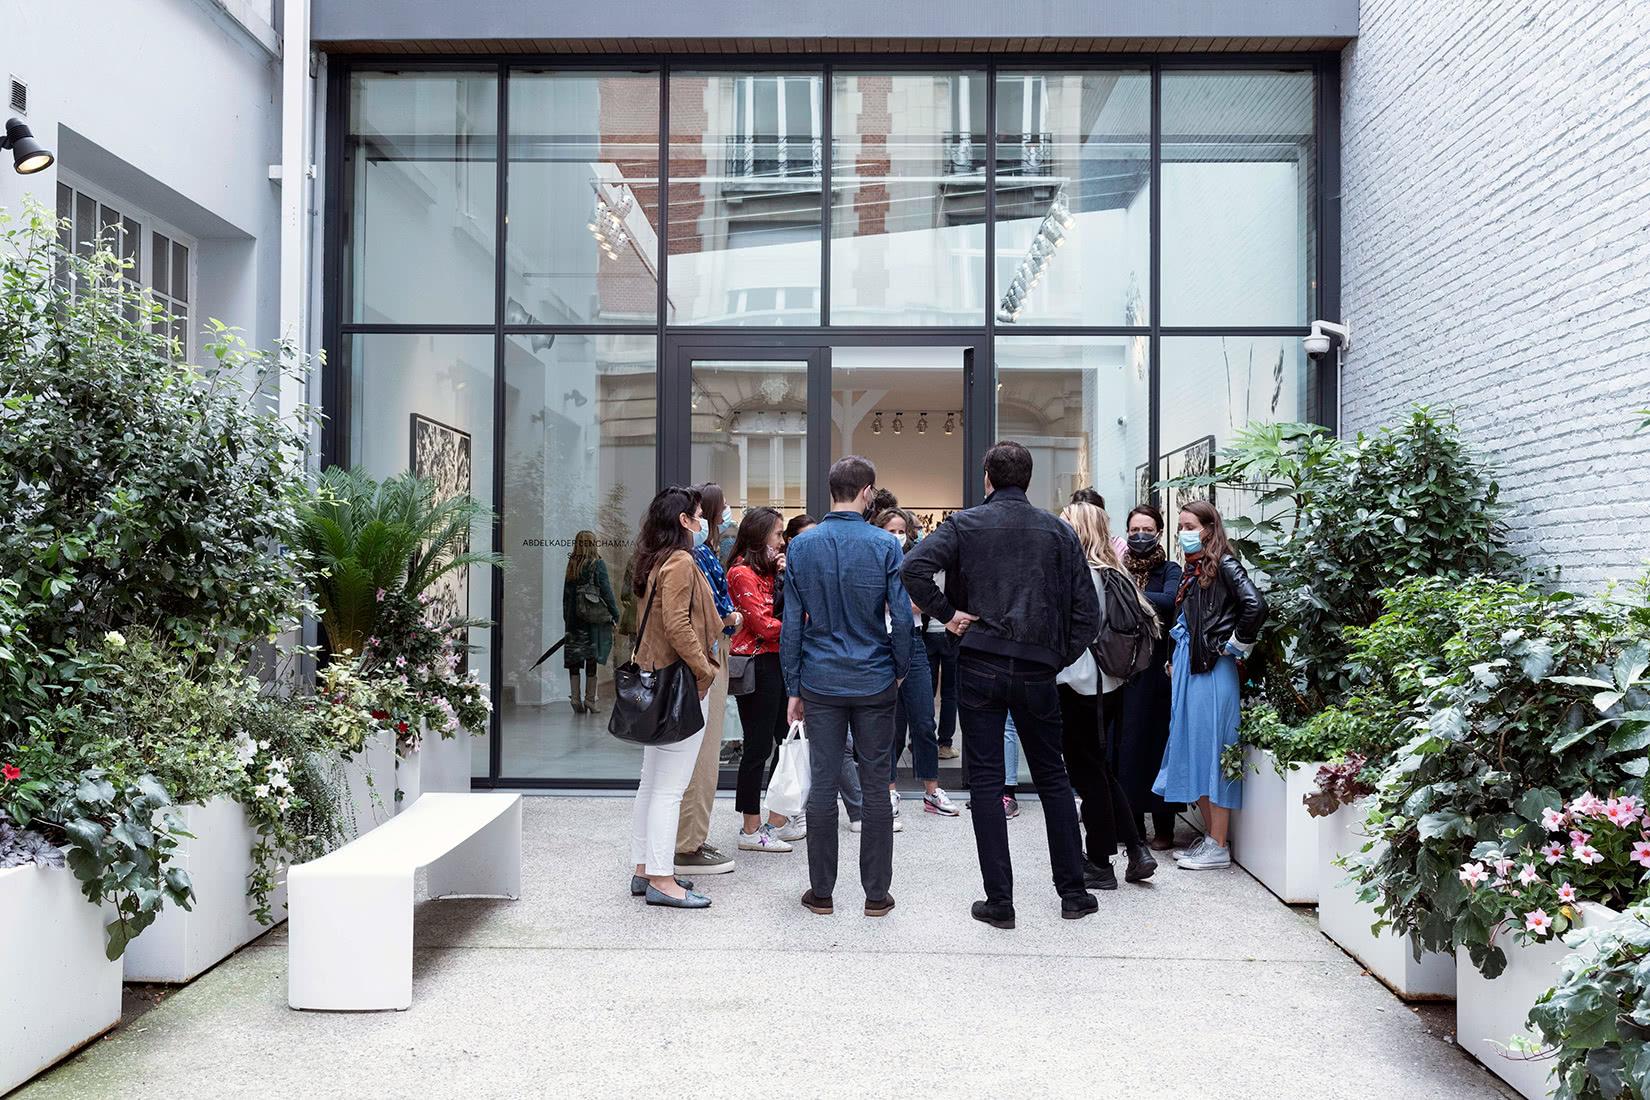 Sybille du Roy brussels art weekend galleries - Luxe Digital